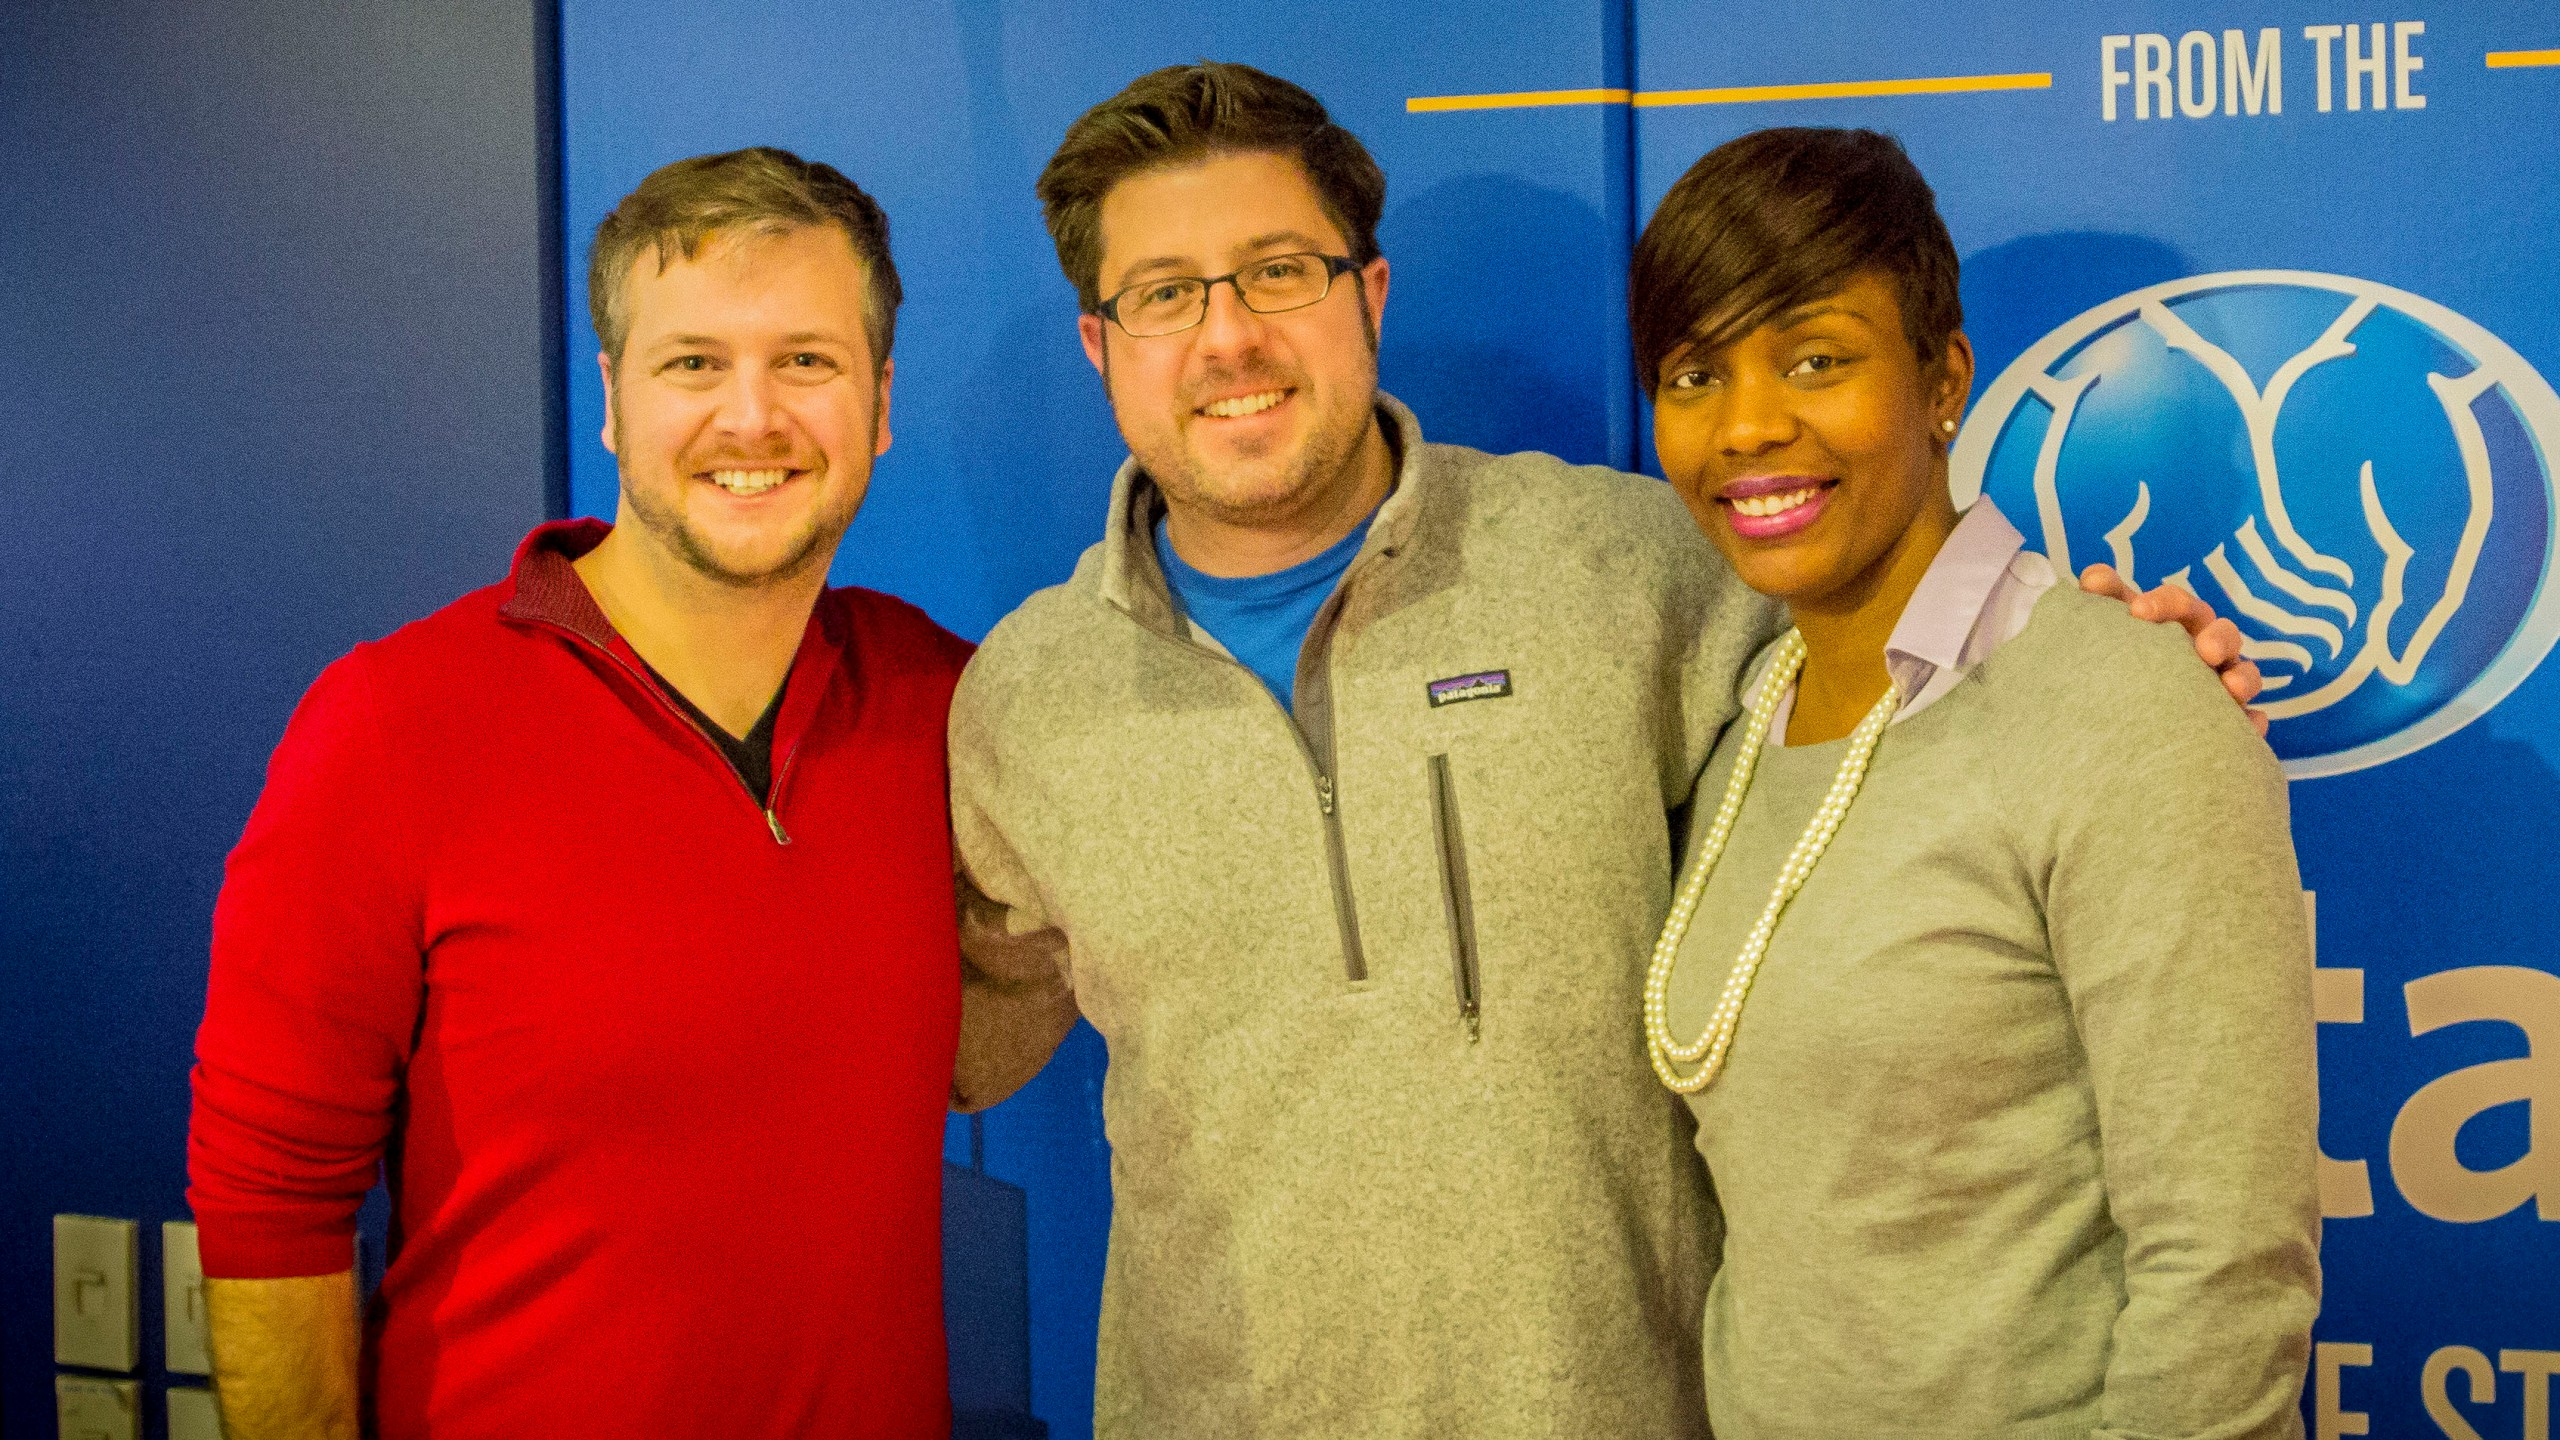 DNAinfo radio news director Jon Hansen and freelance journalist Rashanah Baldwin join OTL host Mike Stephen for our 2014 roundtable show.